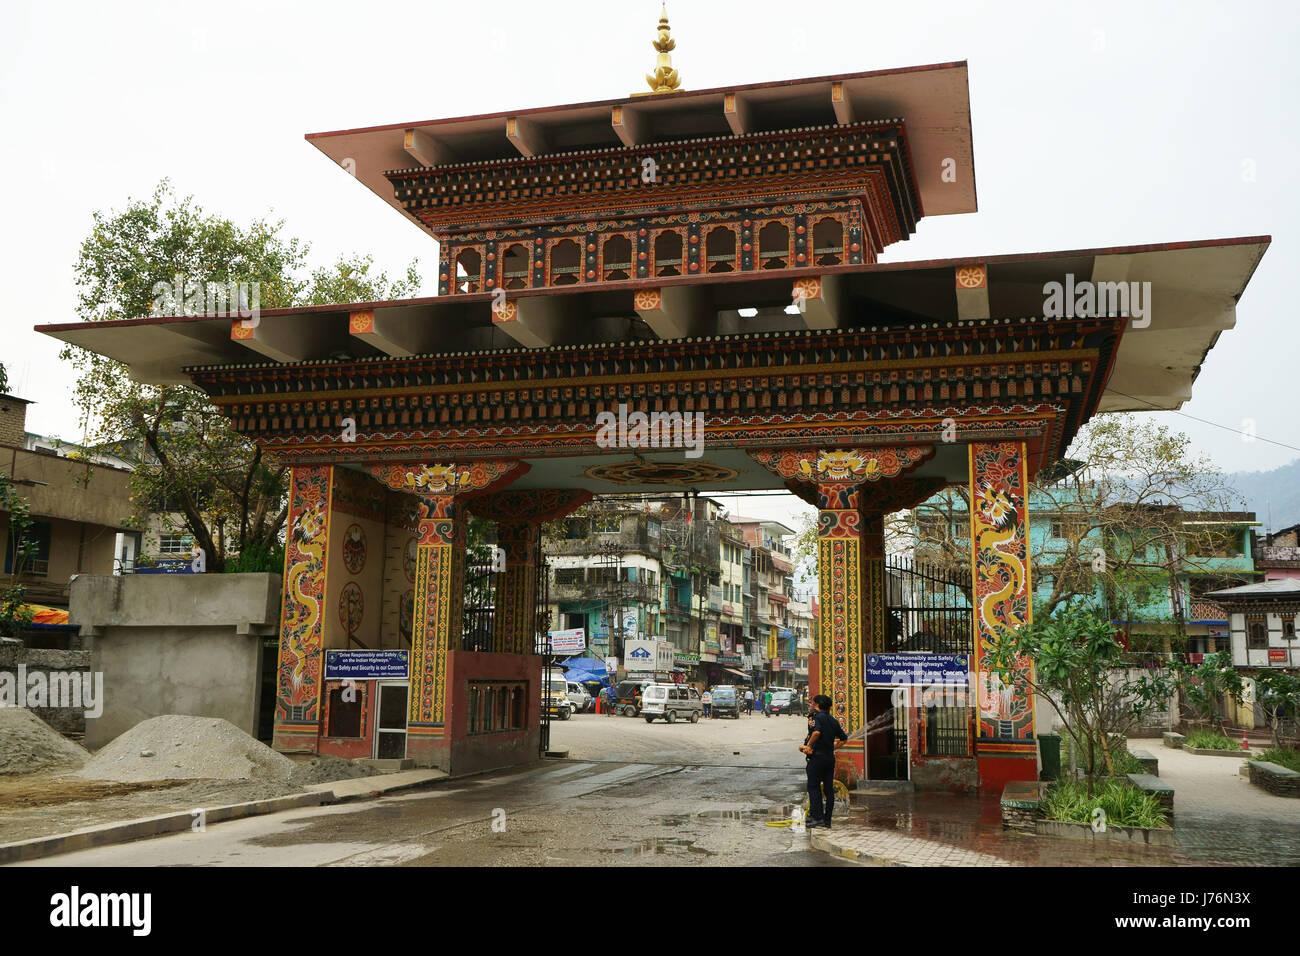 Gate between Bhutan and India at Phuentsholing, seen from Bhutan side, Bhutan - Stock Image